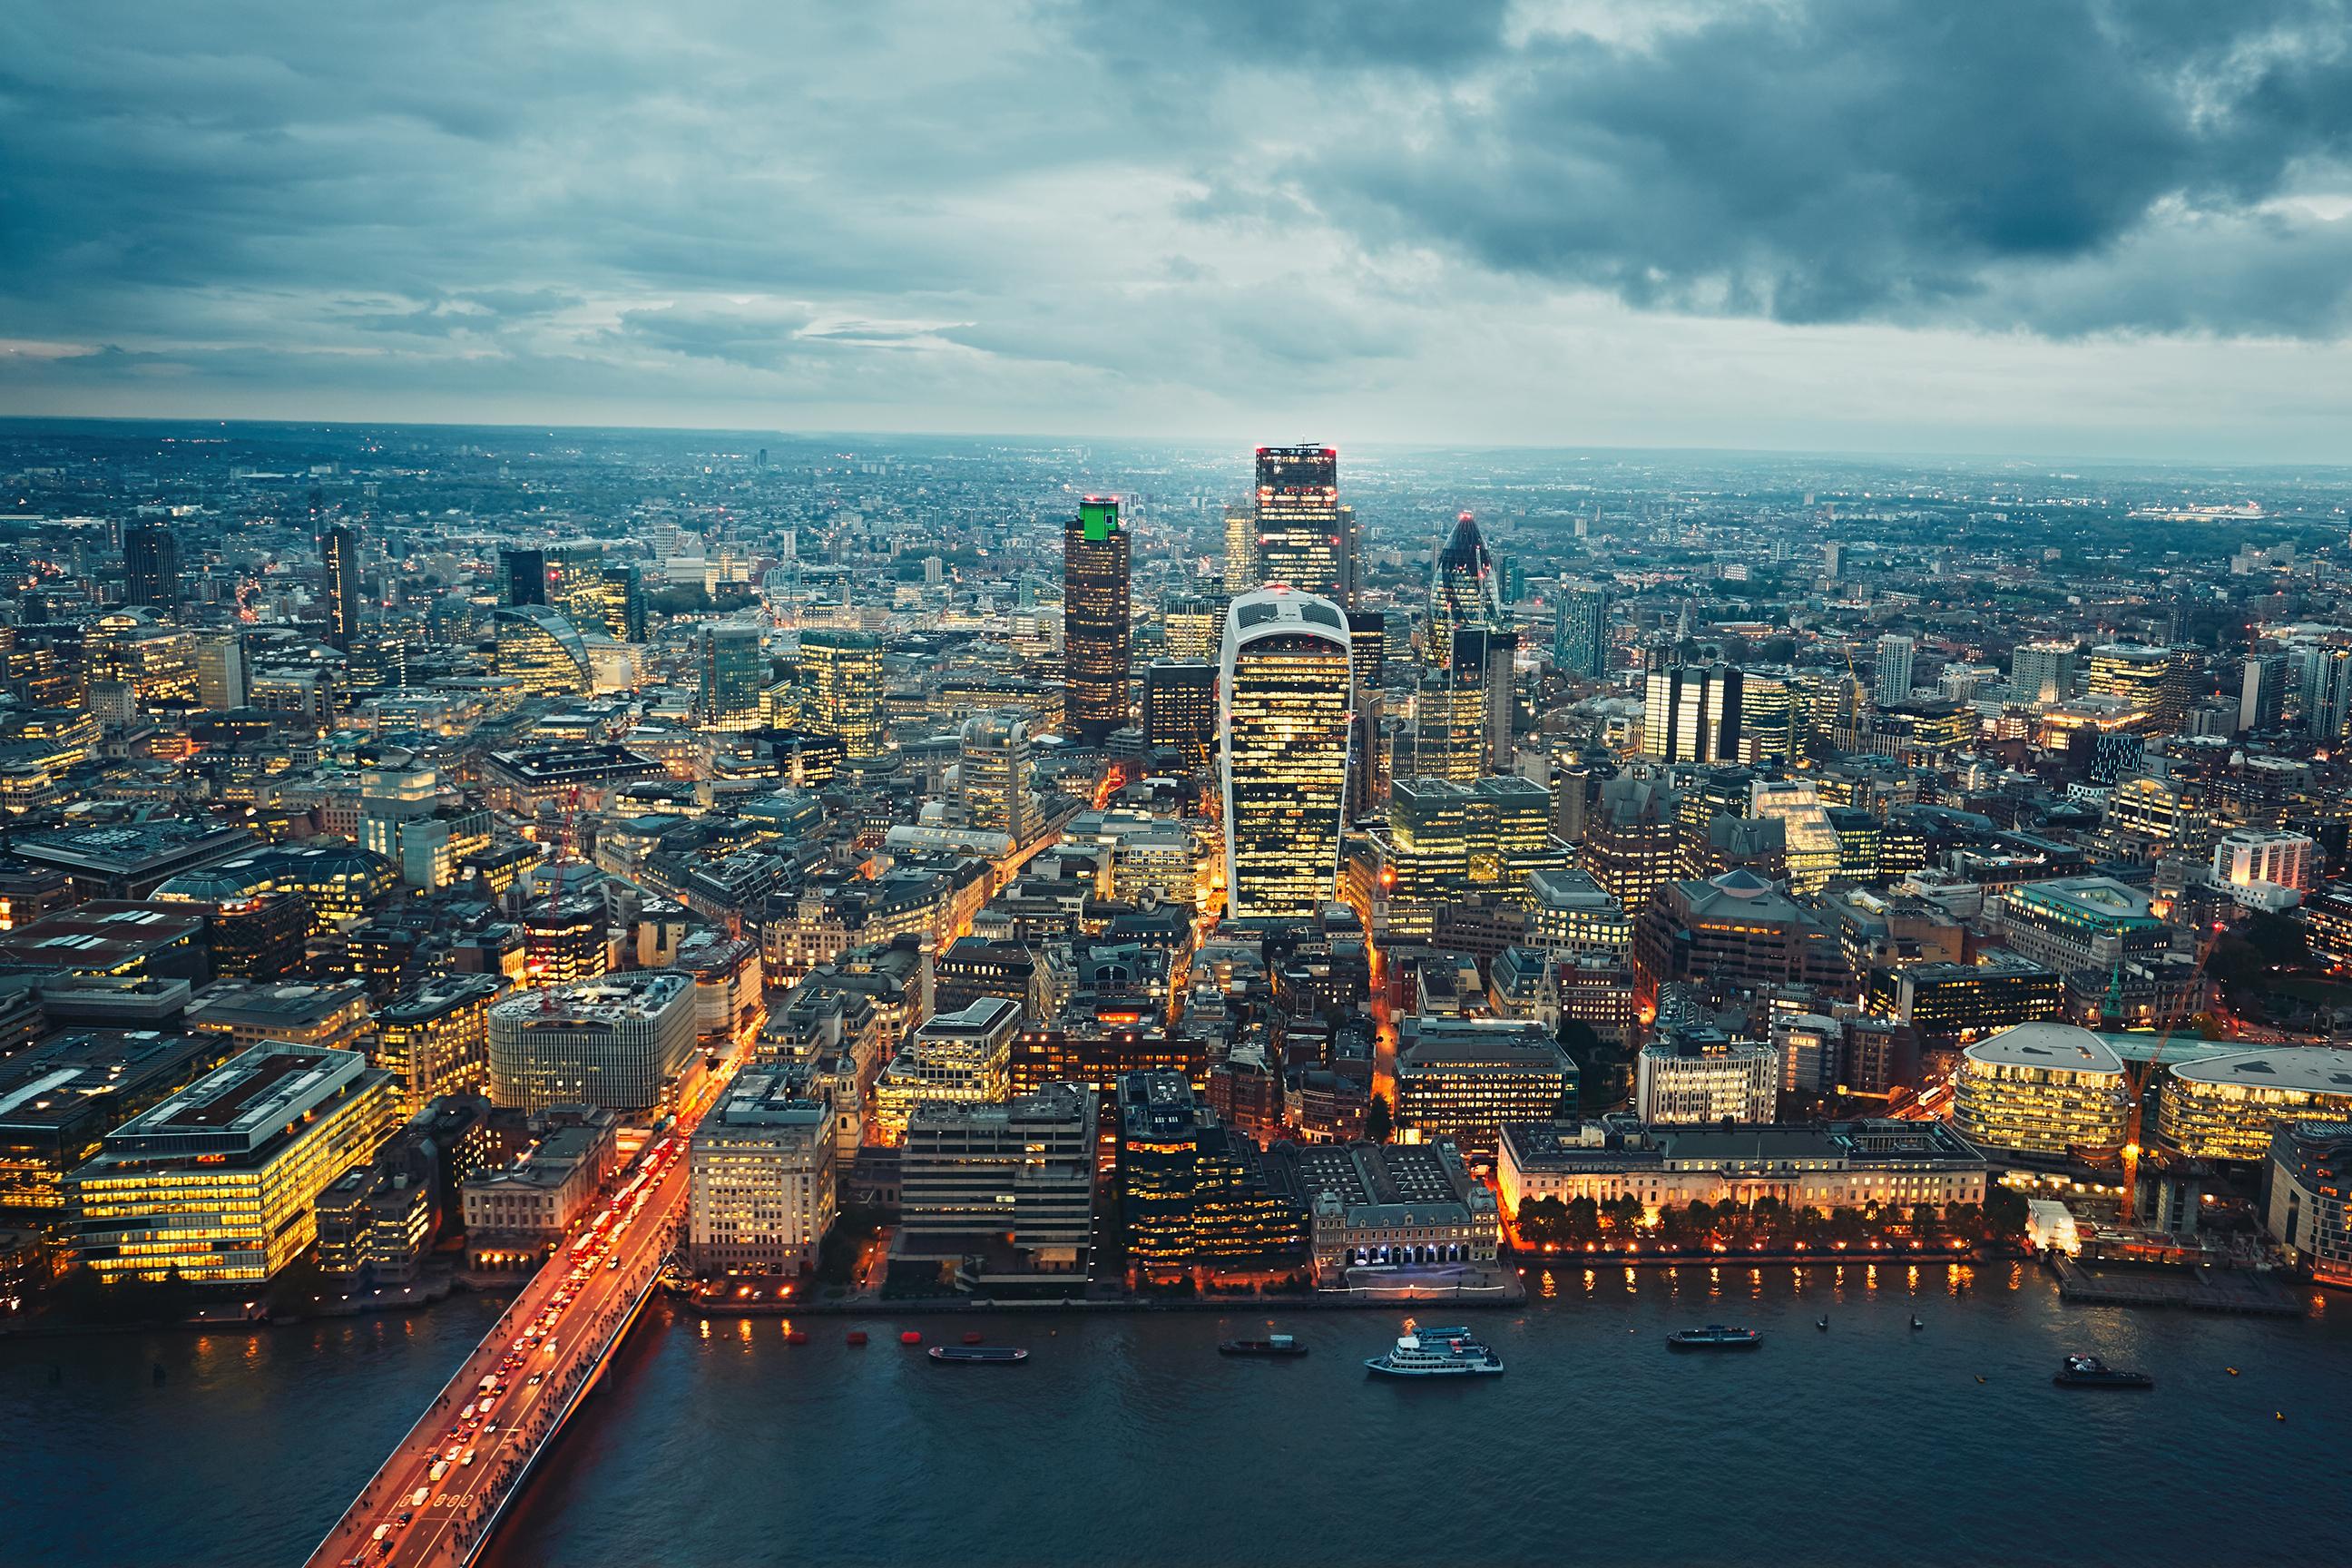 City of london pjzu82c